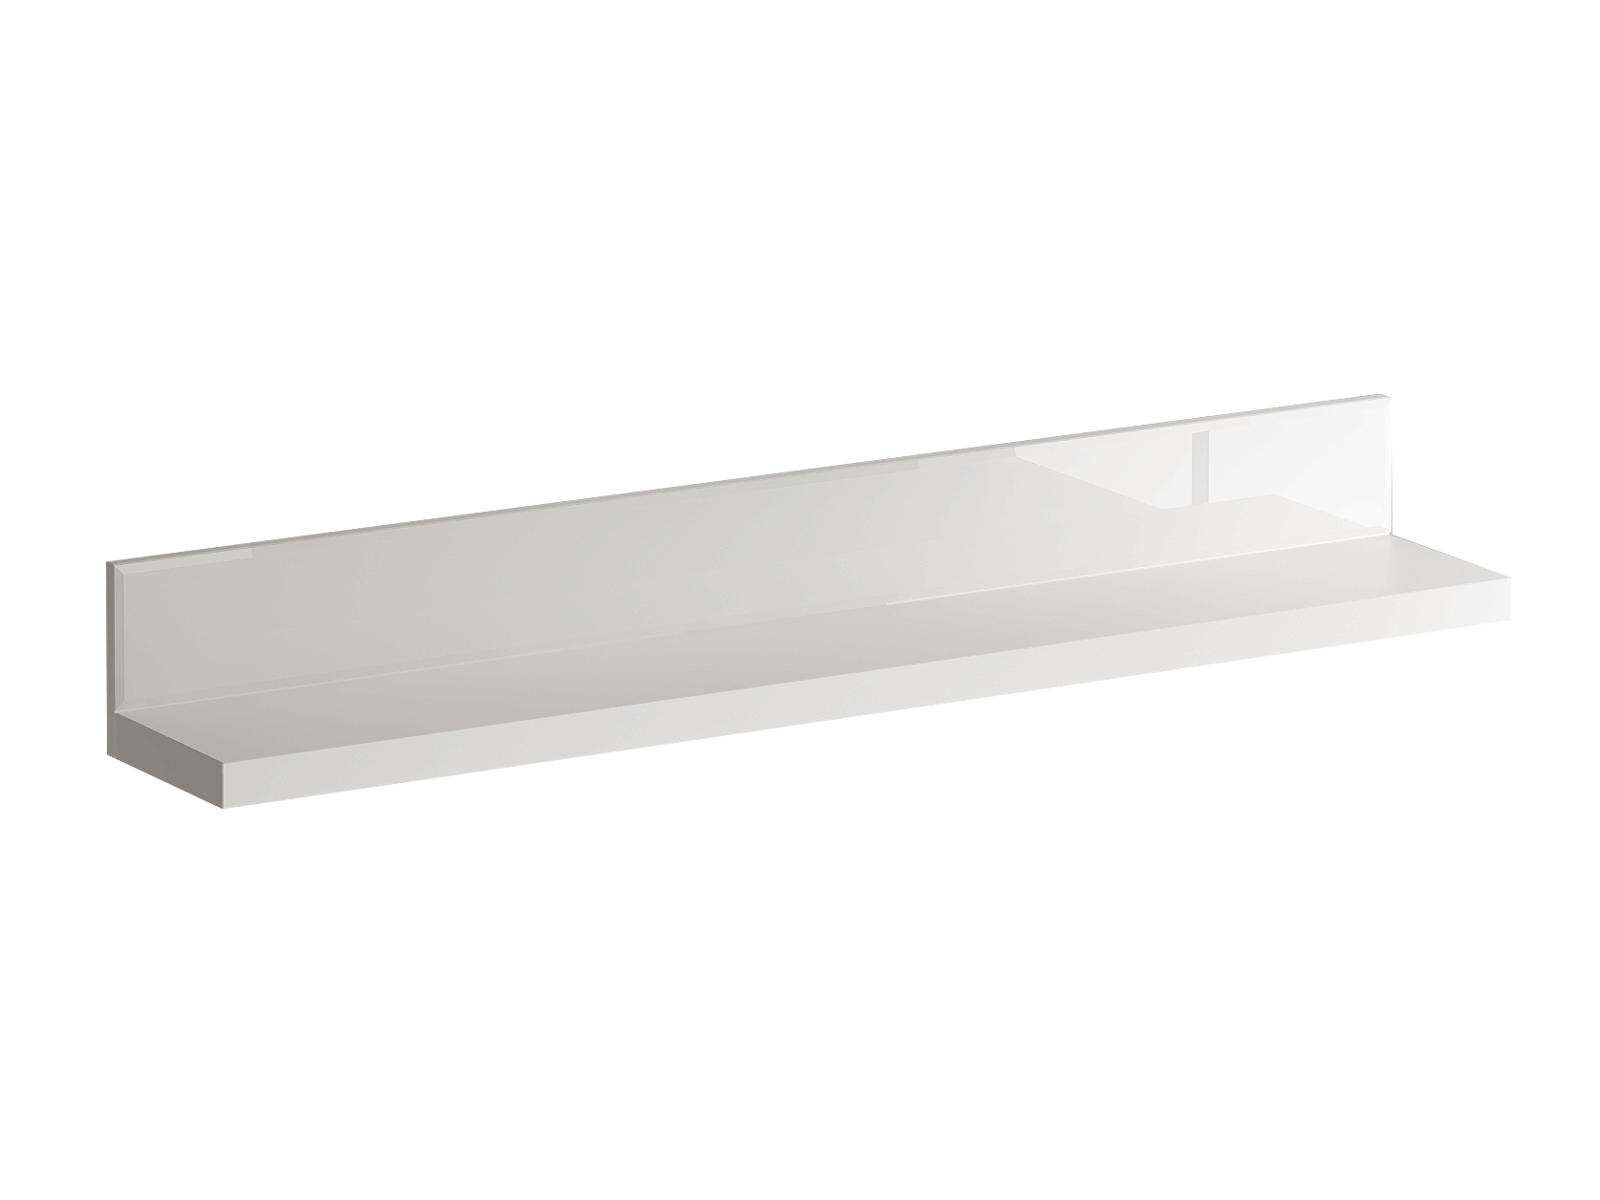 Полка KristalПолки<br>Фасад - стекло белое.<br><br>Material: ДСП<br>Ширина см: 145<br>Высота см: 18<br>Глубина см: 23